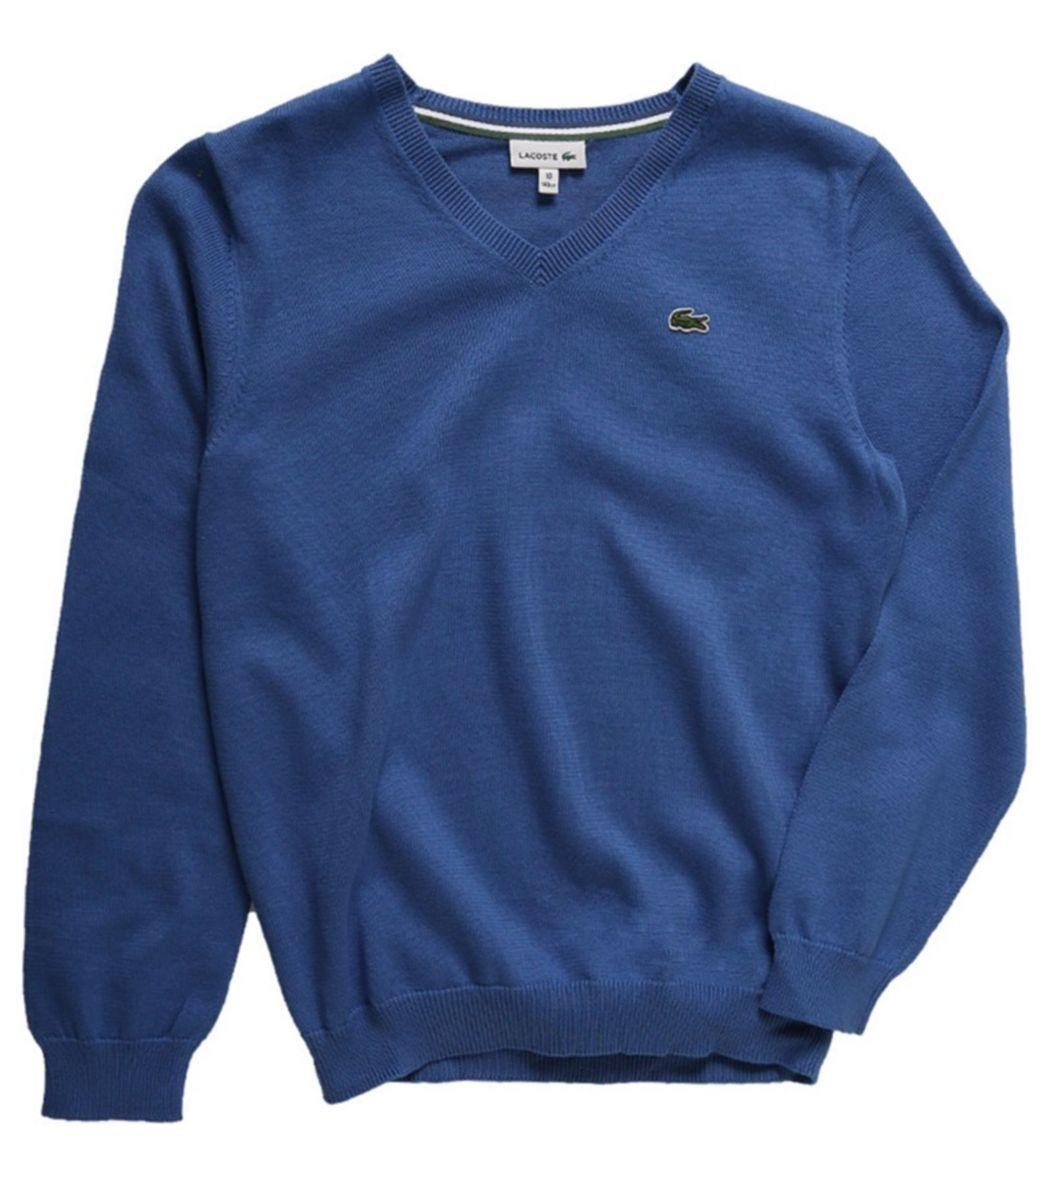 2e3d53d4ae034 suéter de tricô lacoste - casacos lacoste.  Czm6ly9wag90b3muzw5qb2vplmnvbs5ici9wcm9kdwn0cy8xmzi2ntavmjdmzjdkngy2ogfjodjmzmmzyjg2yjk1ztblmmzkmjauanbn